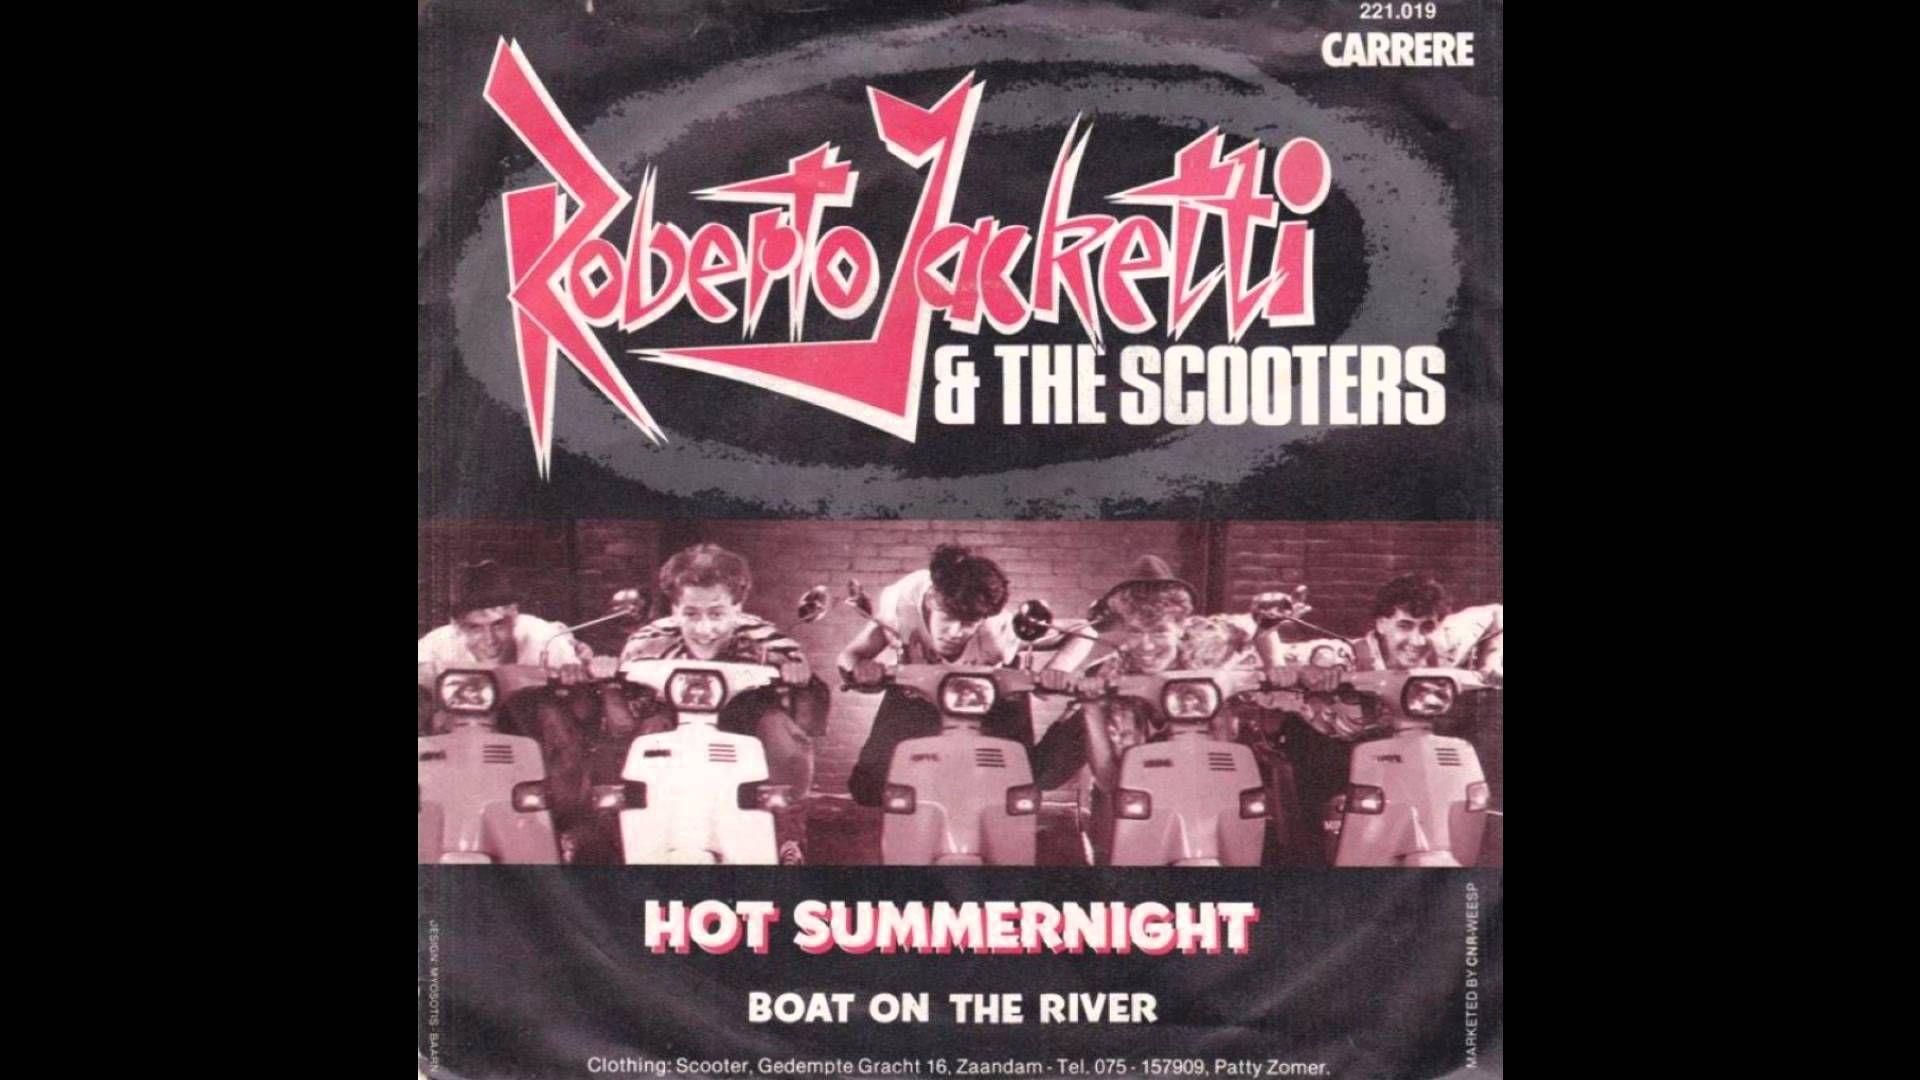 Roberto Jacketti & The Scooters - Hot Summernight (1983)